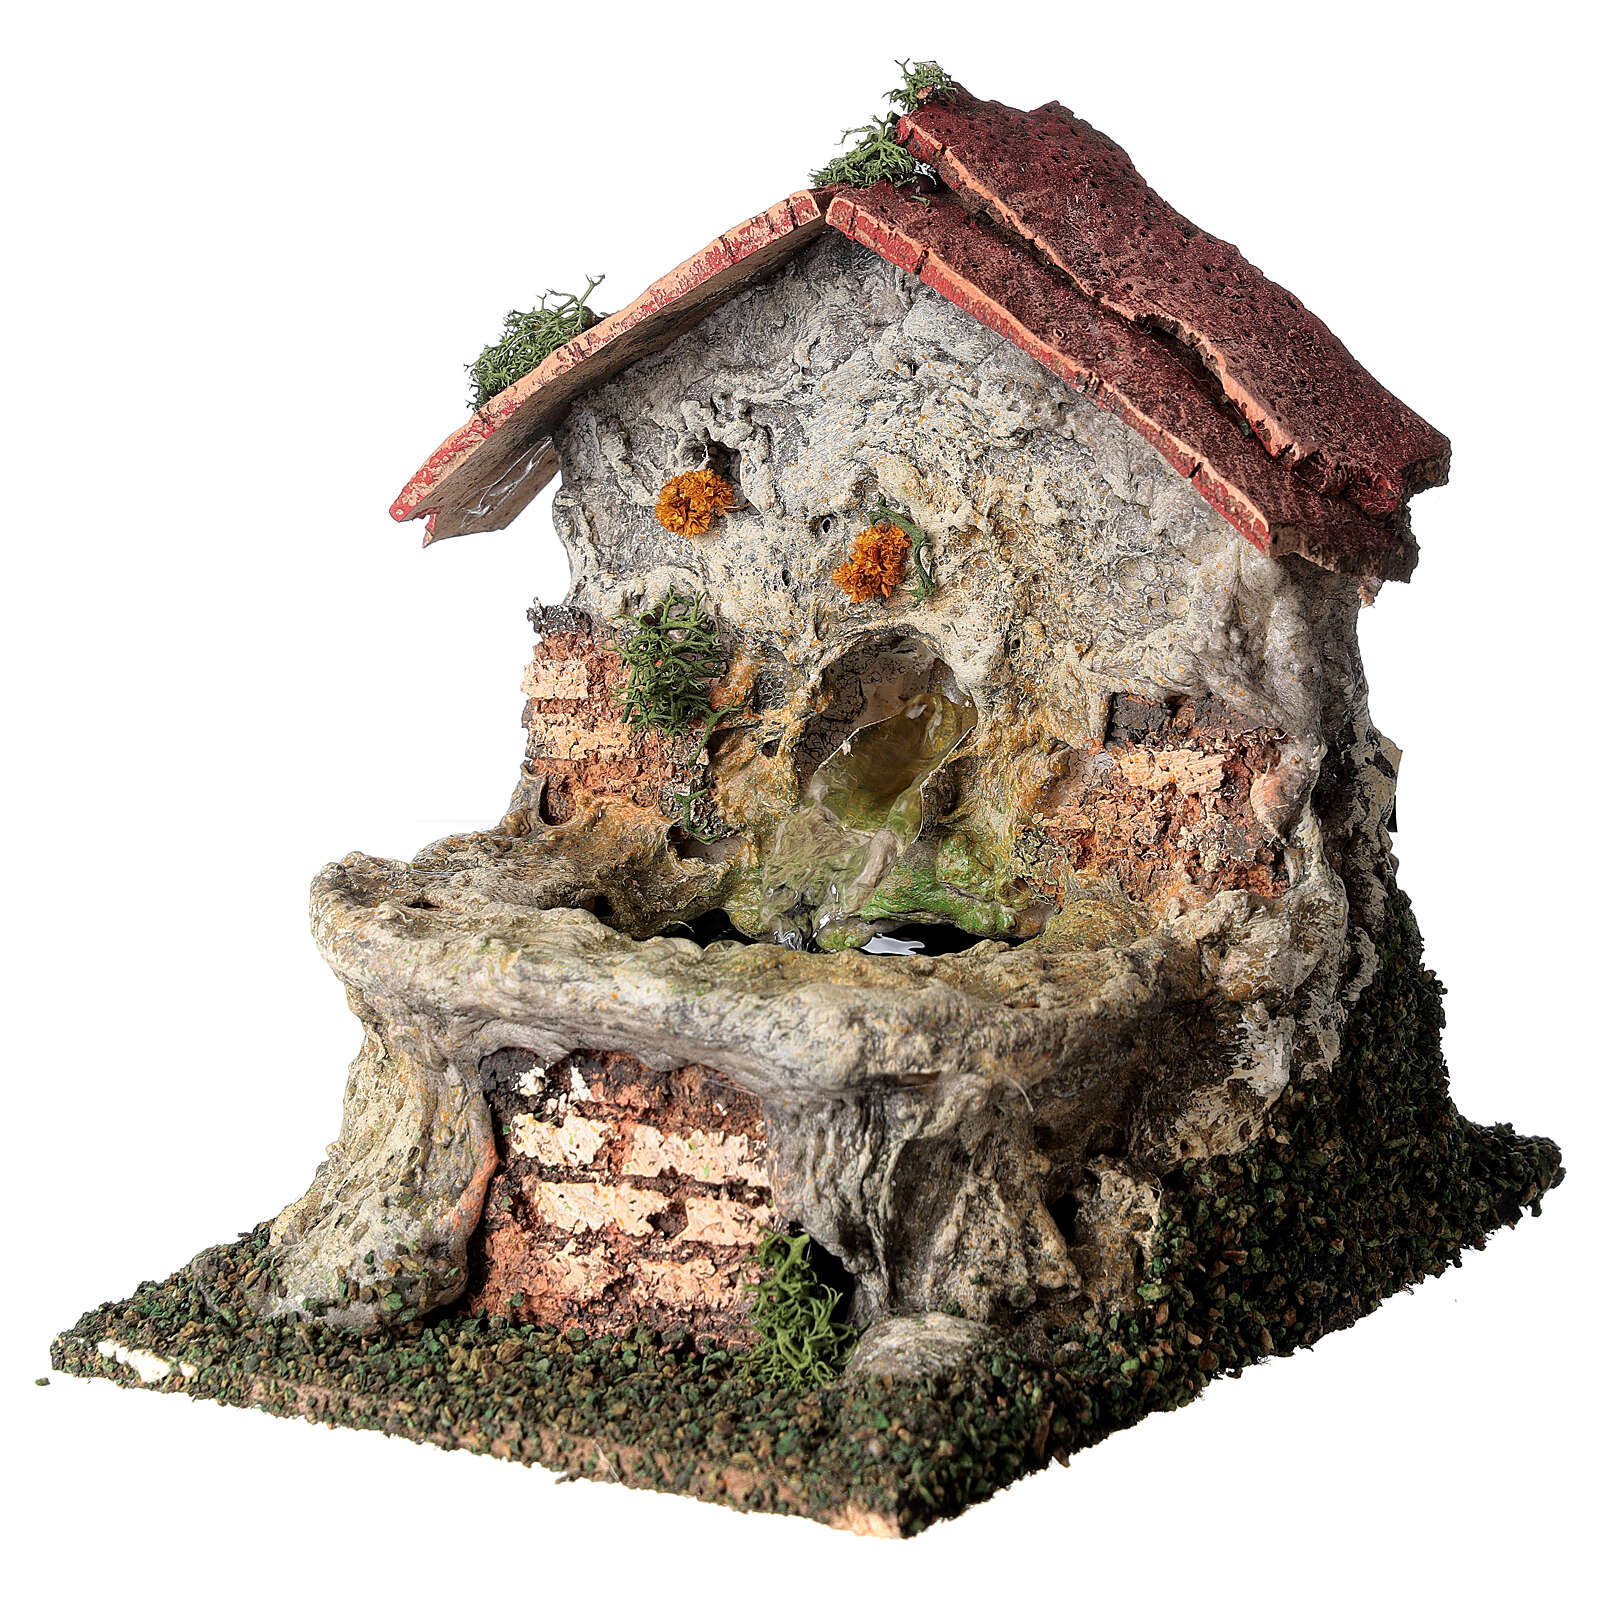 Masonry electric fountain 15x10x15 cm for Nativity Scene with 8-10 cm figurines 4